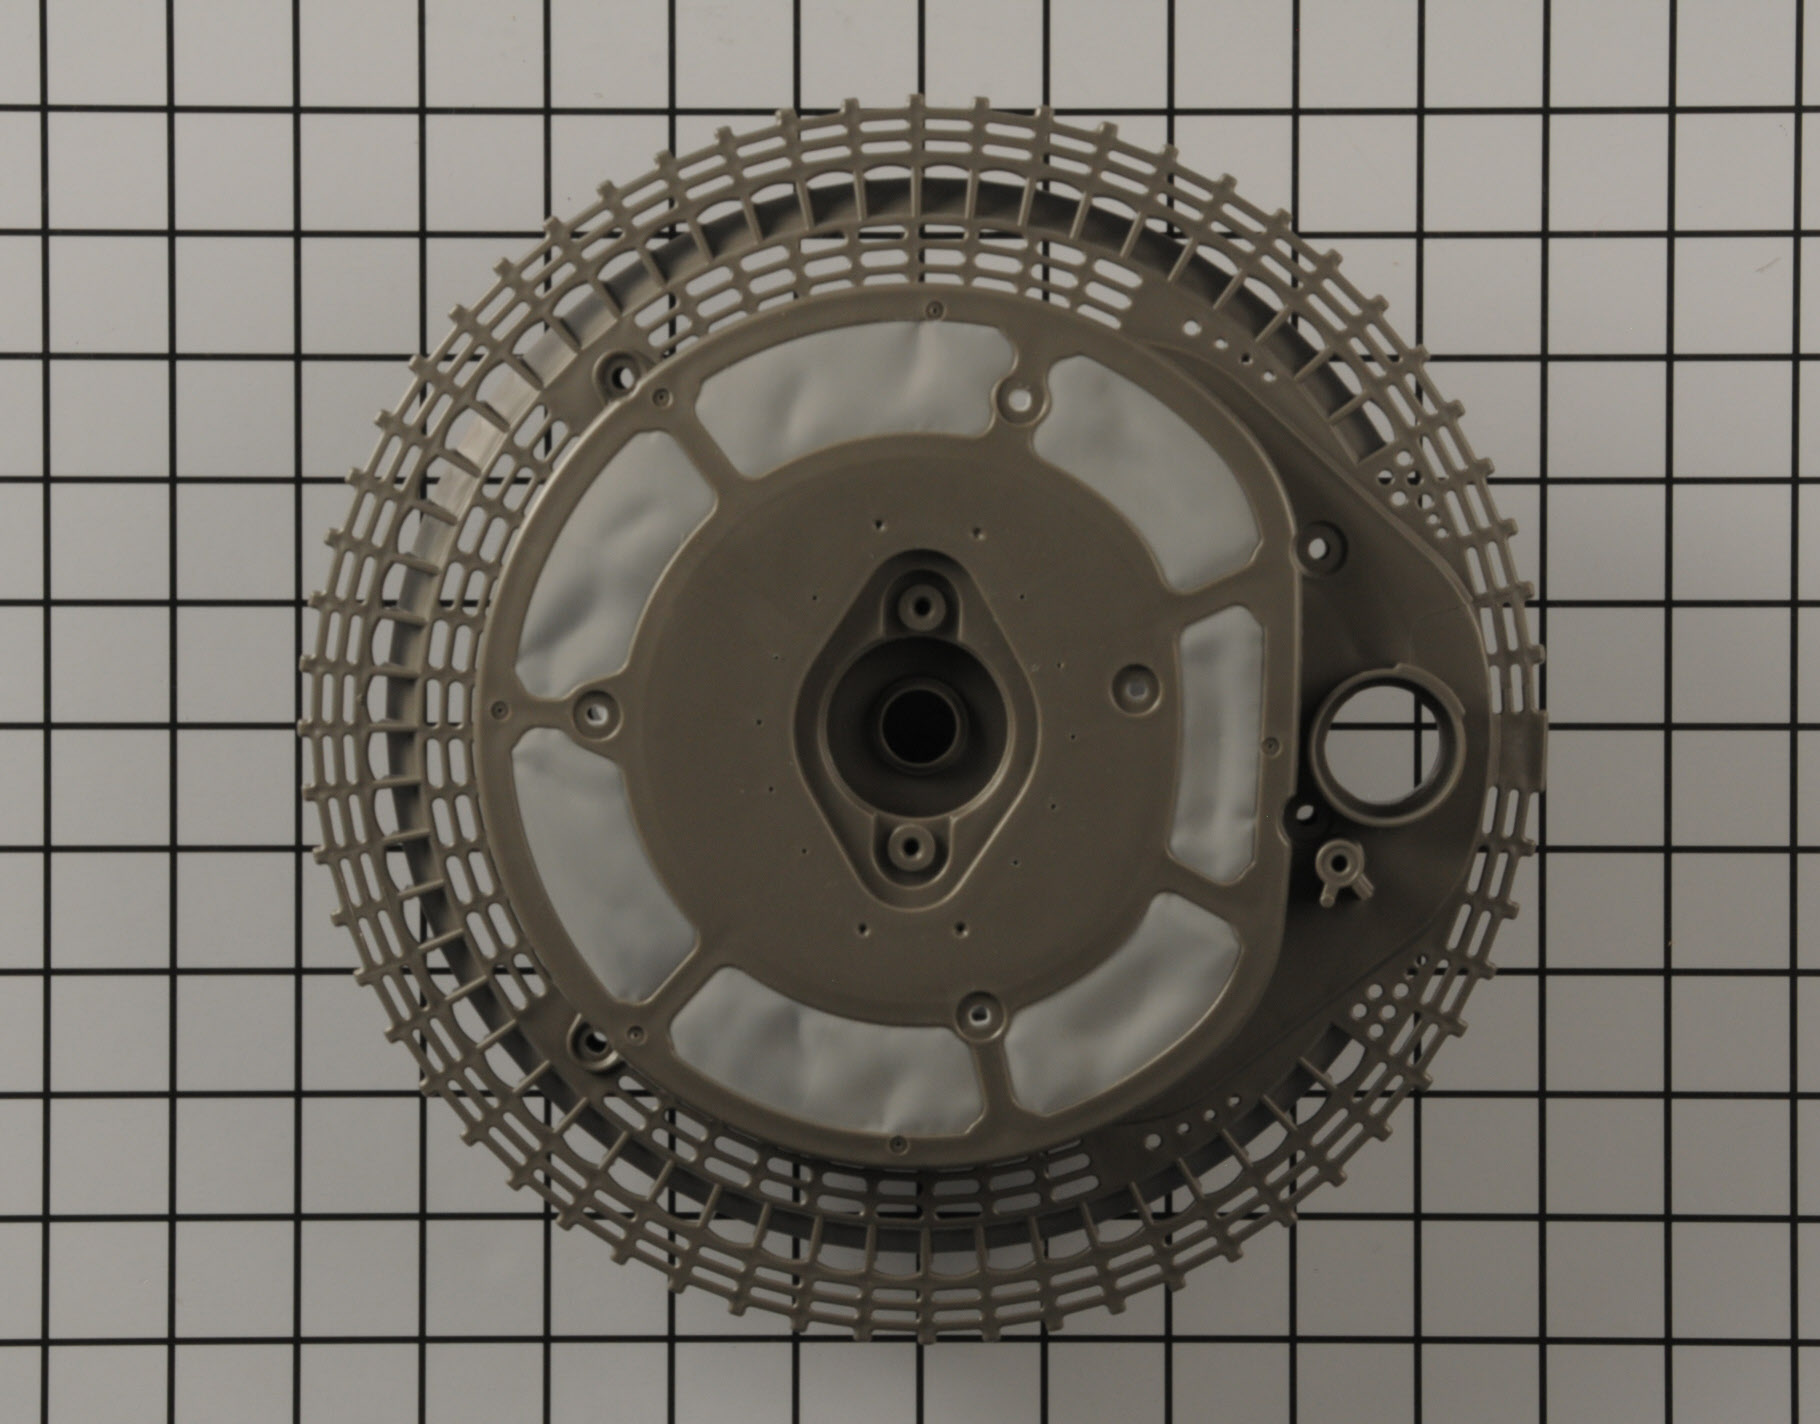 LG Dishwasher Part # ADQ32598202 - Pump Filter